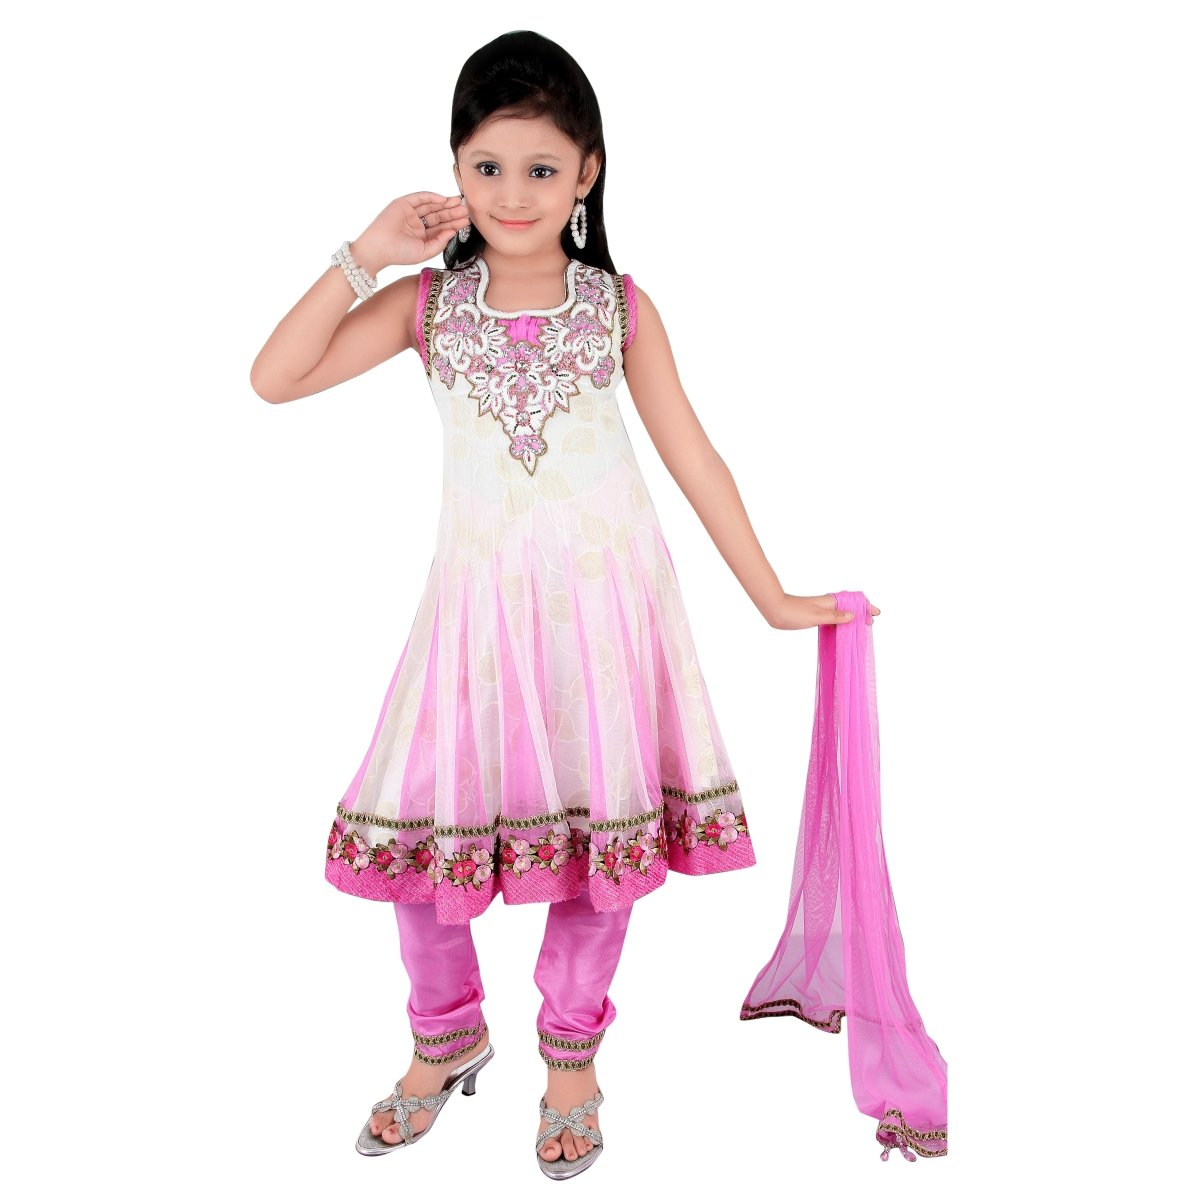 Shilp-Kala White Soft Net Partywear Embroidered Indian Salwar Kameez - TSSJSK3303 SKTSSJSK3303